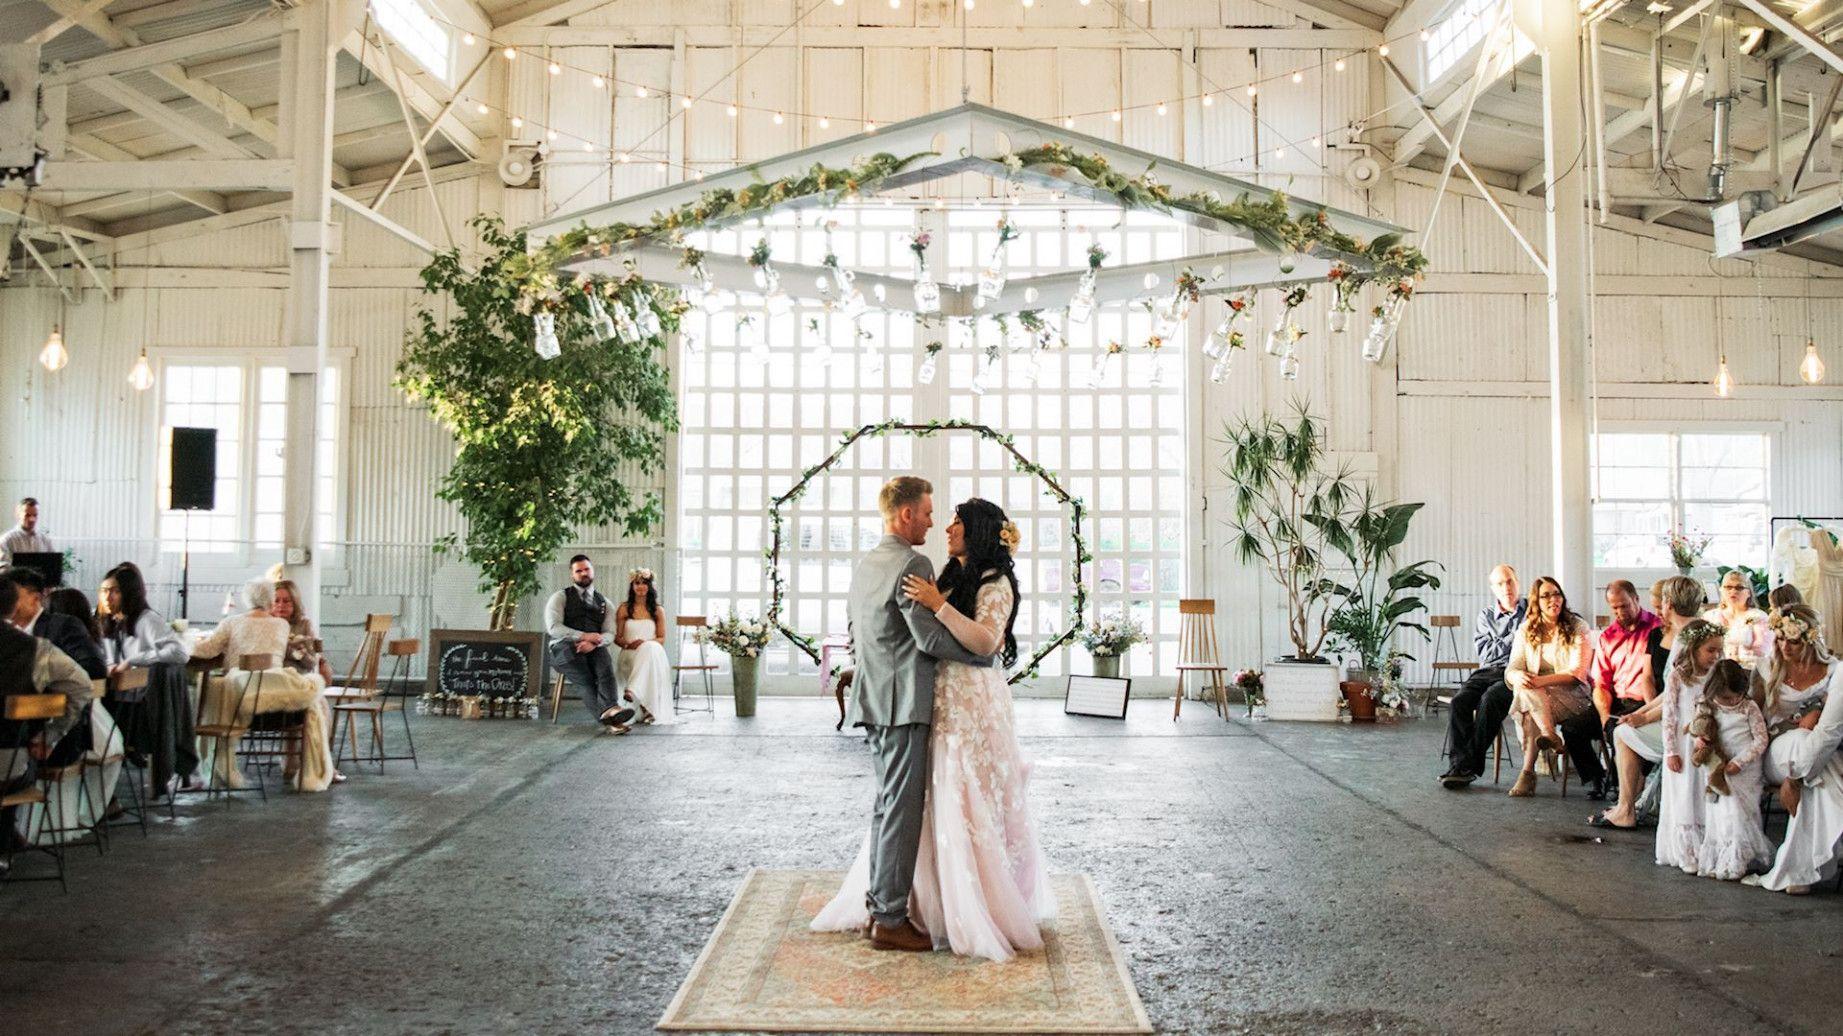 The 11 Secrets You Will Never Know About Weddings Budget Pernikahan Lagu Pernikahan Dekorasi Perkawinan